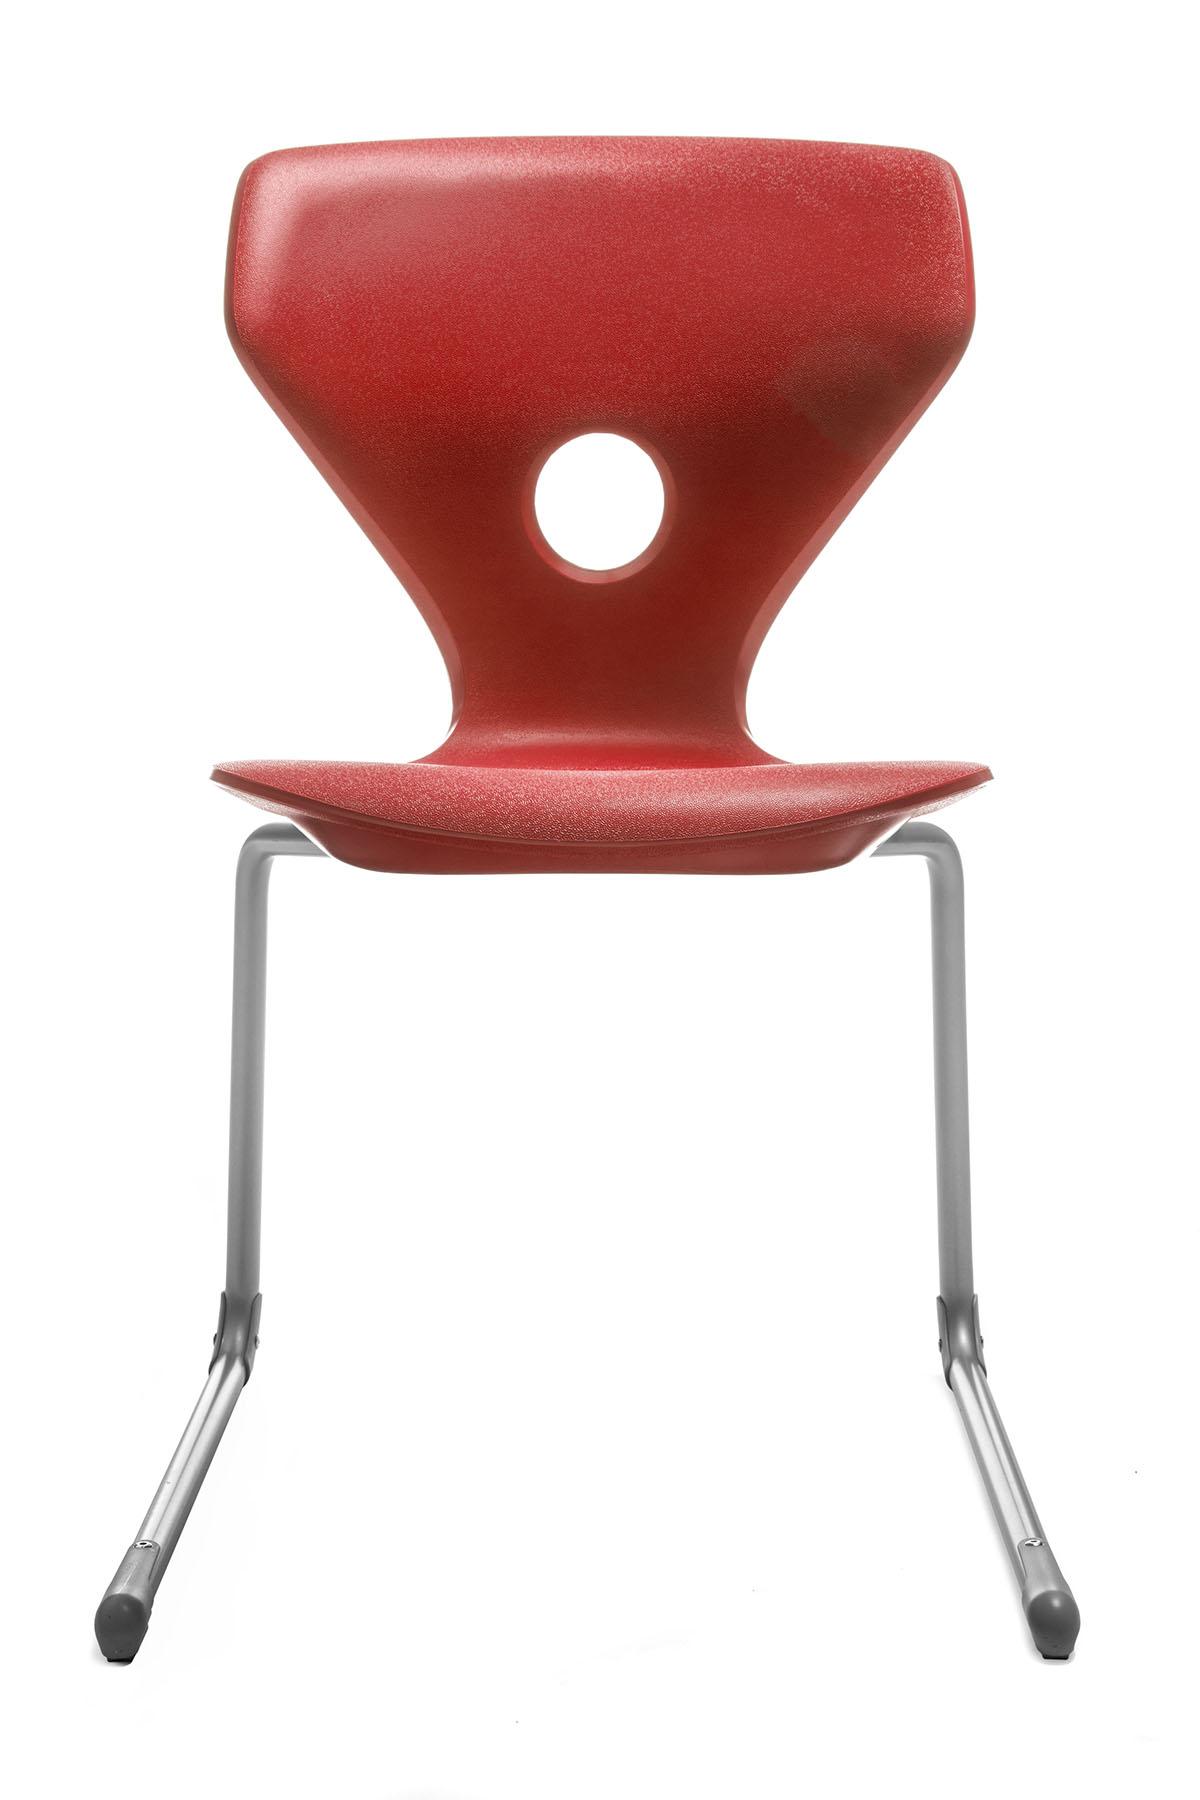 Red School Chair. Red School Chair O - Fizzyinc.co